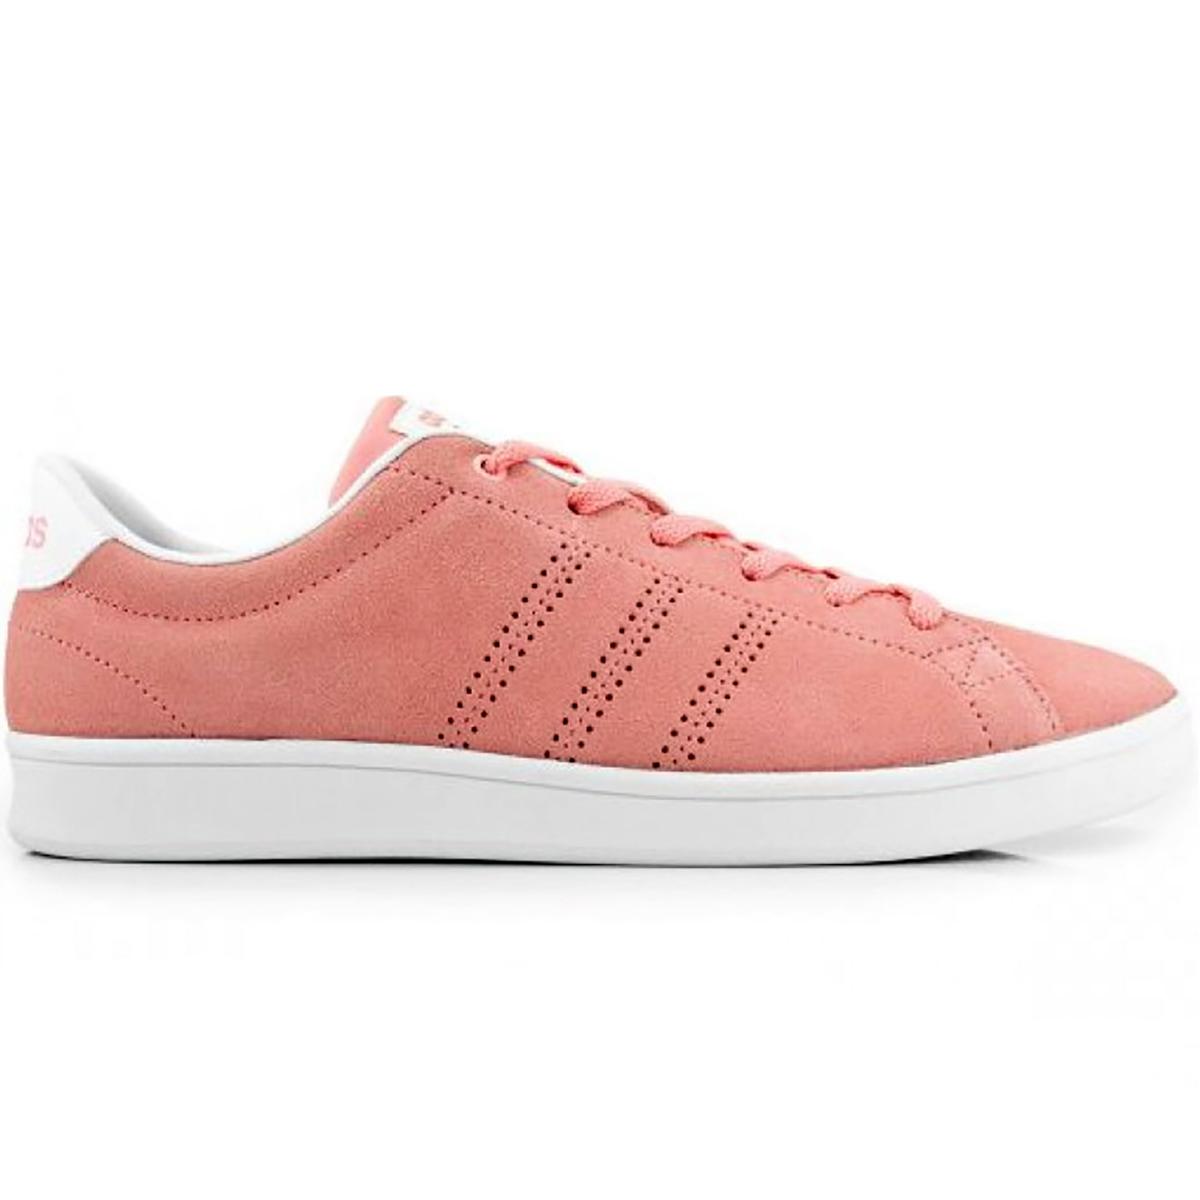 460e9fa2bc Tênis Adidas Advantage Clean QT Rosa Feminino - Compre Agora  Cabana ...